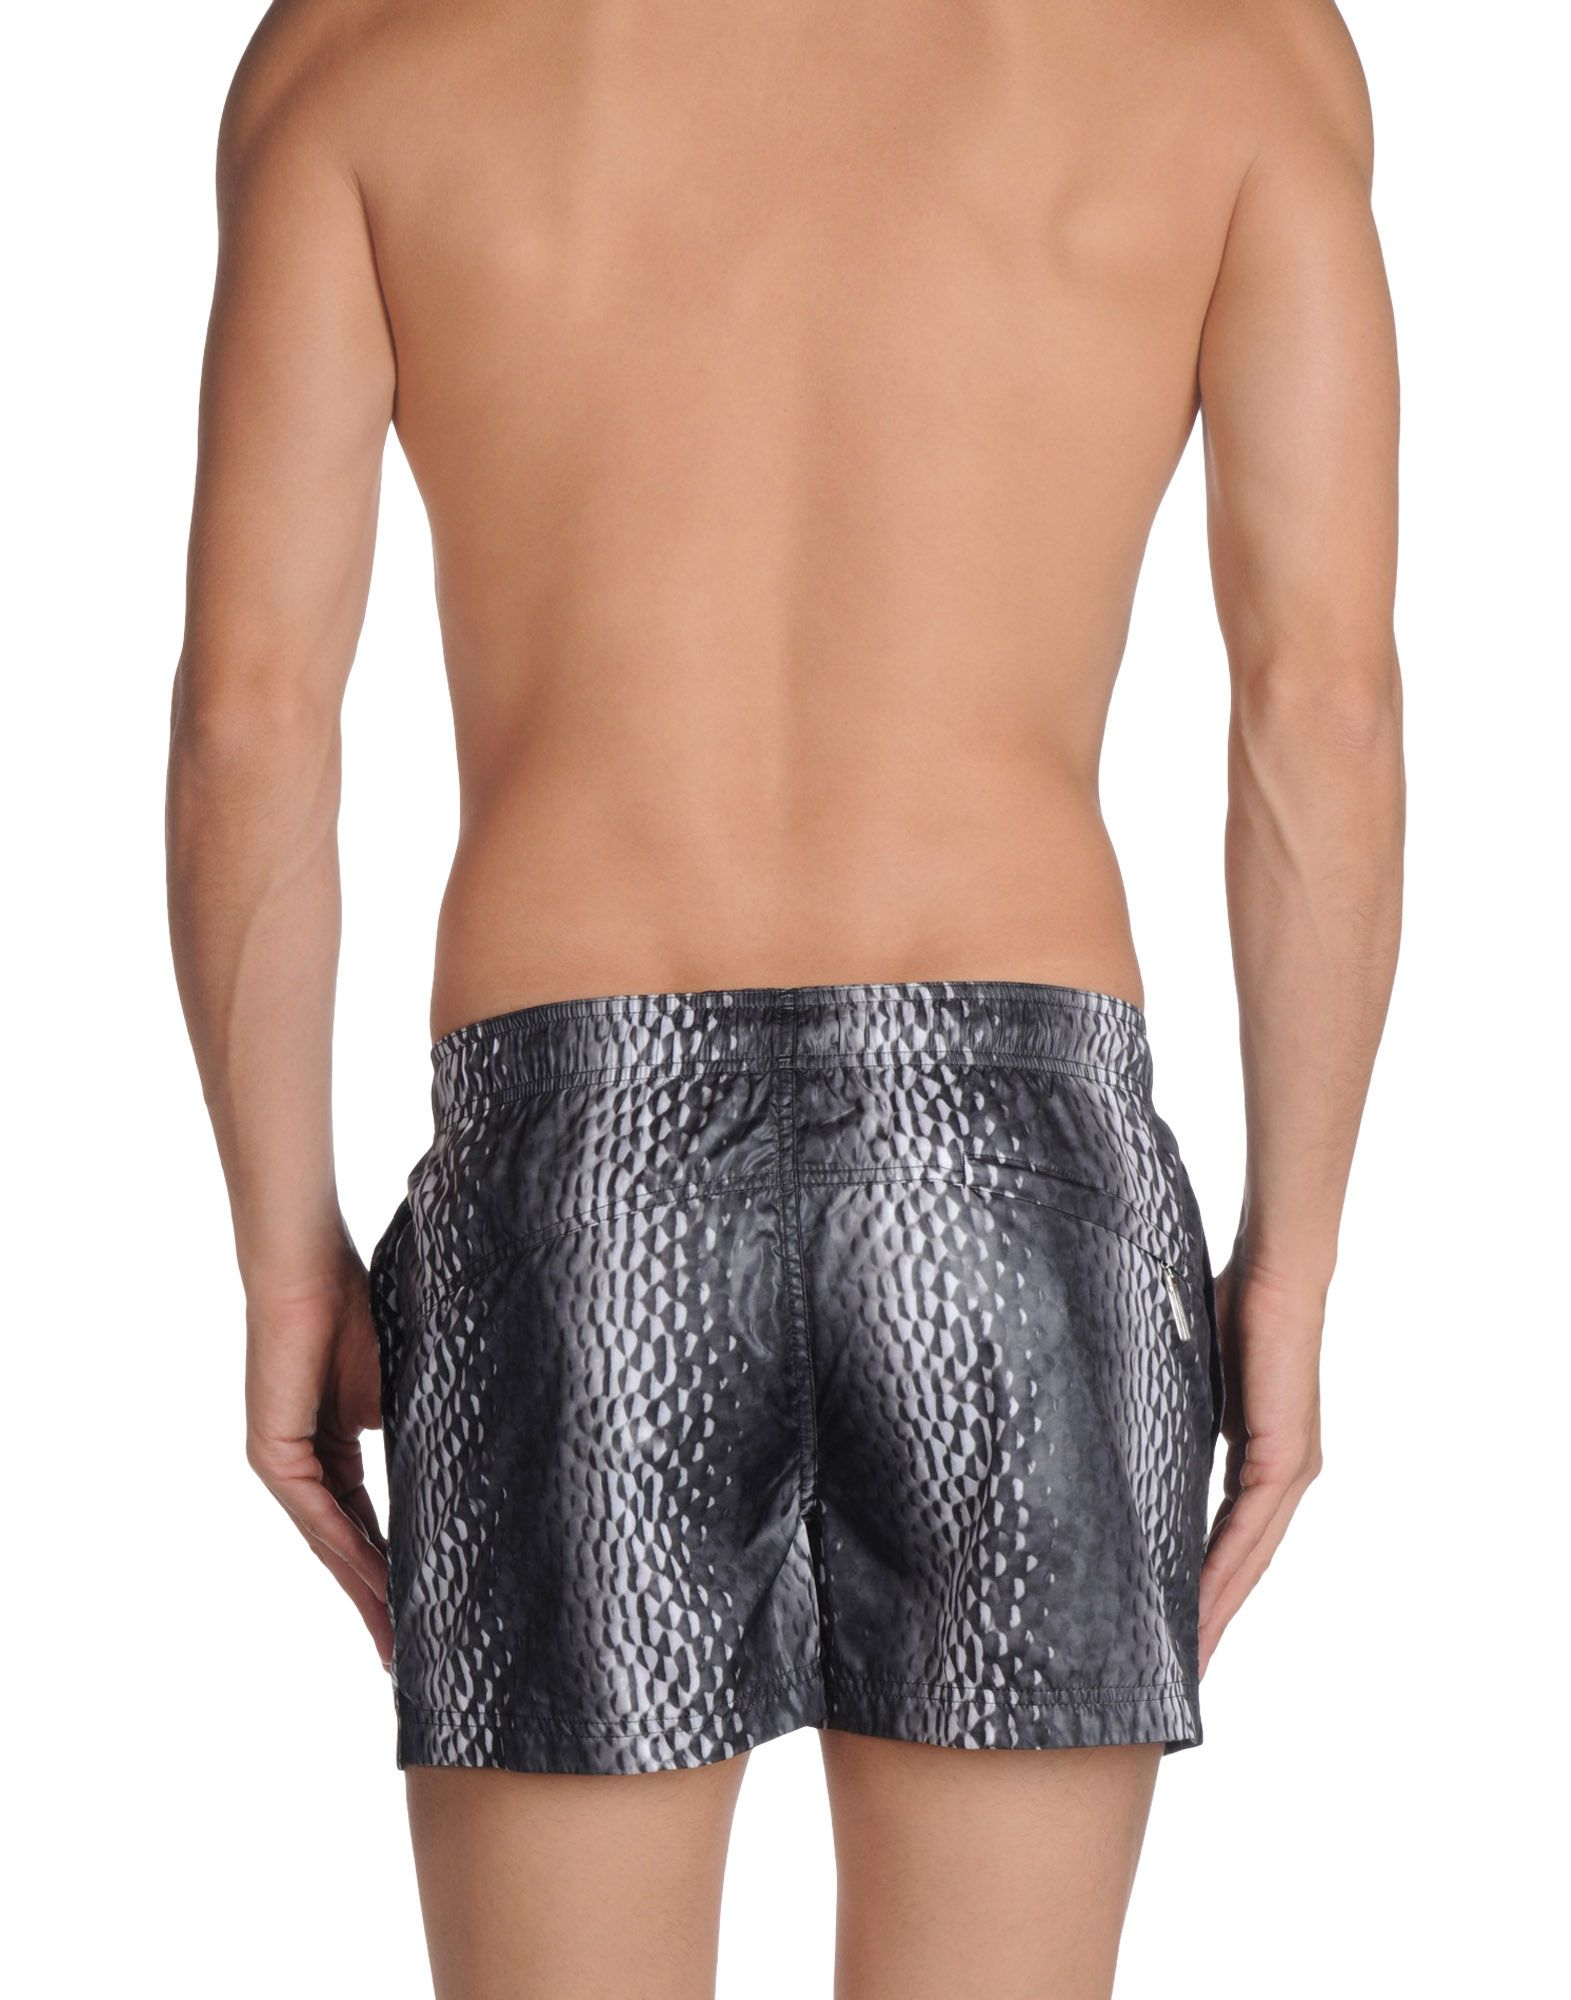 lyst calvin klein swimming trunk in gray for men. Black Bedroom Furniture Sets. Home Design Ideas